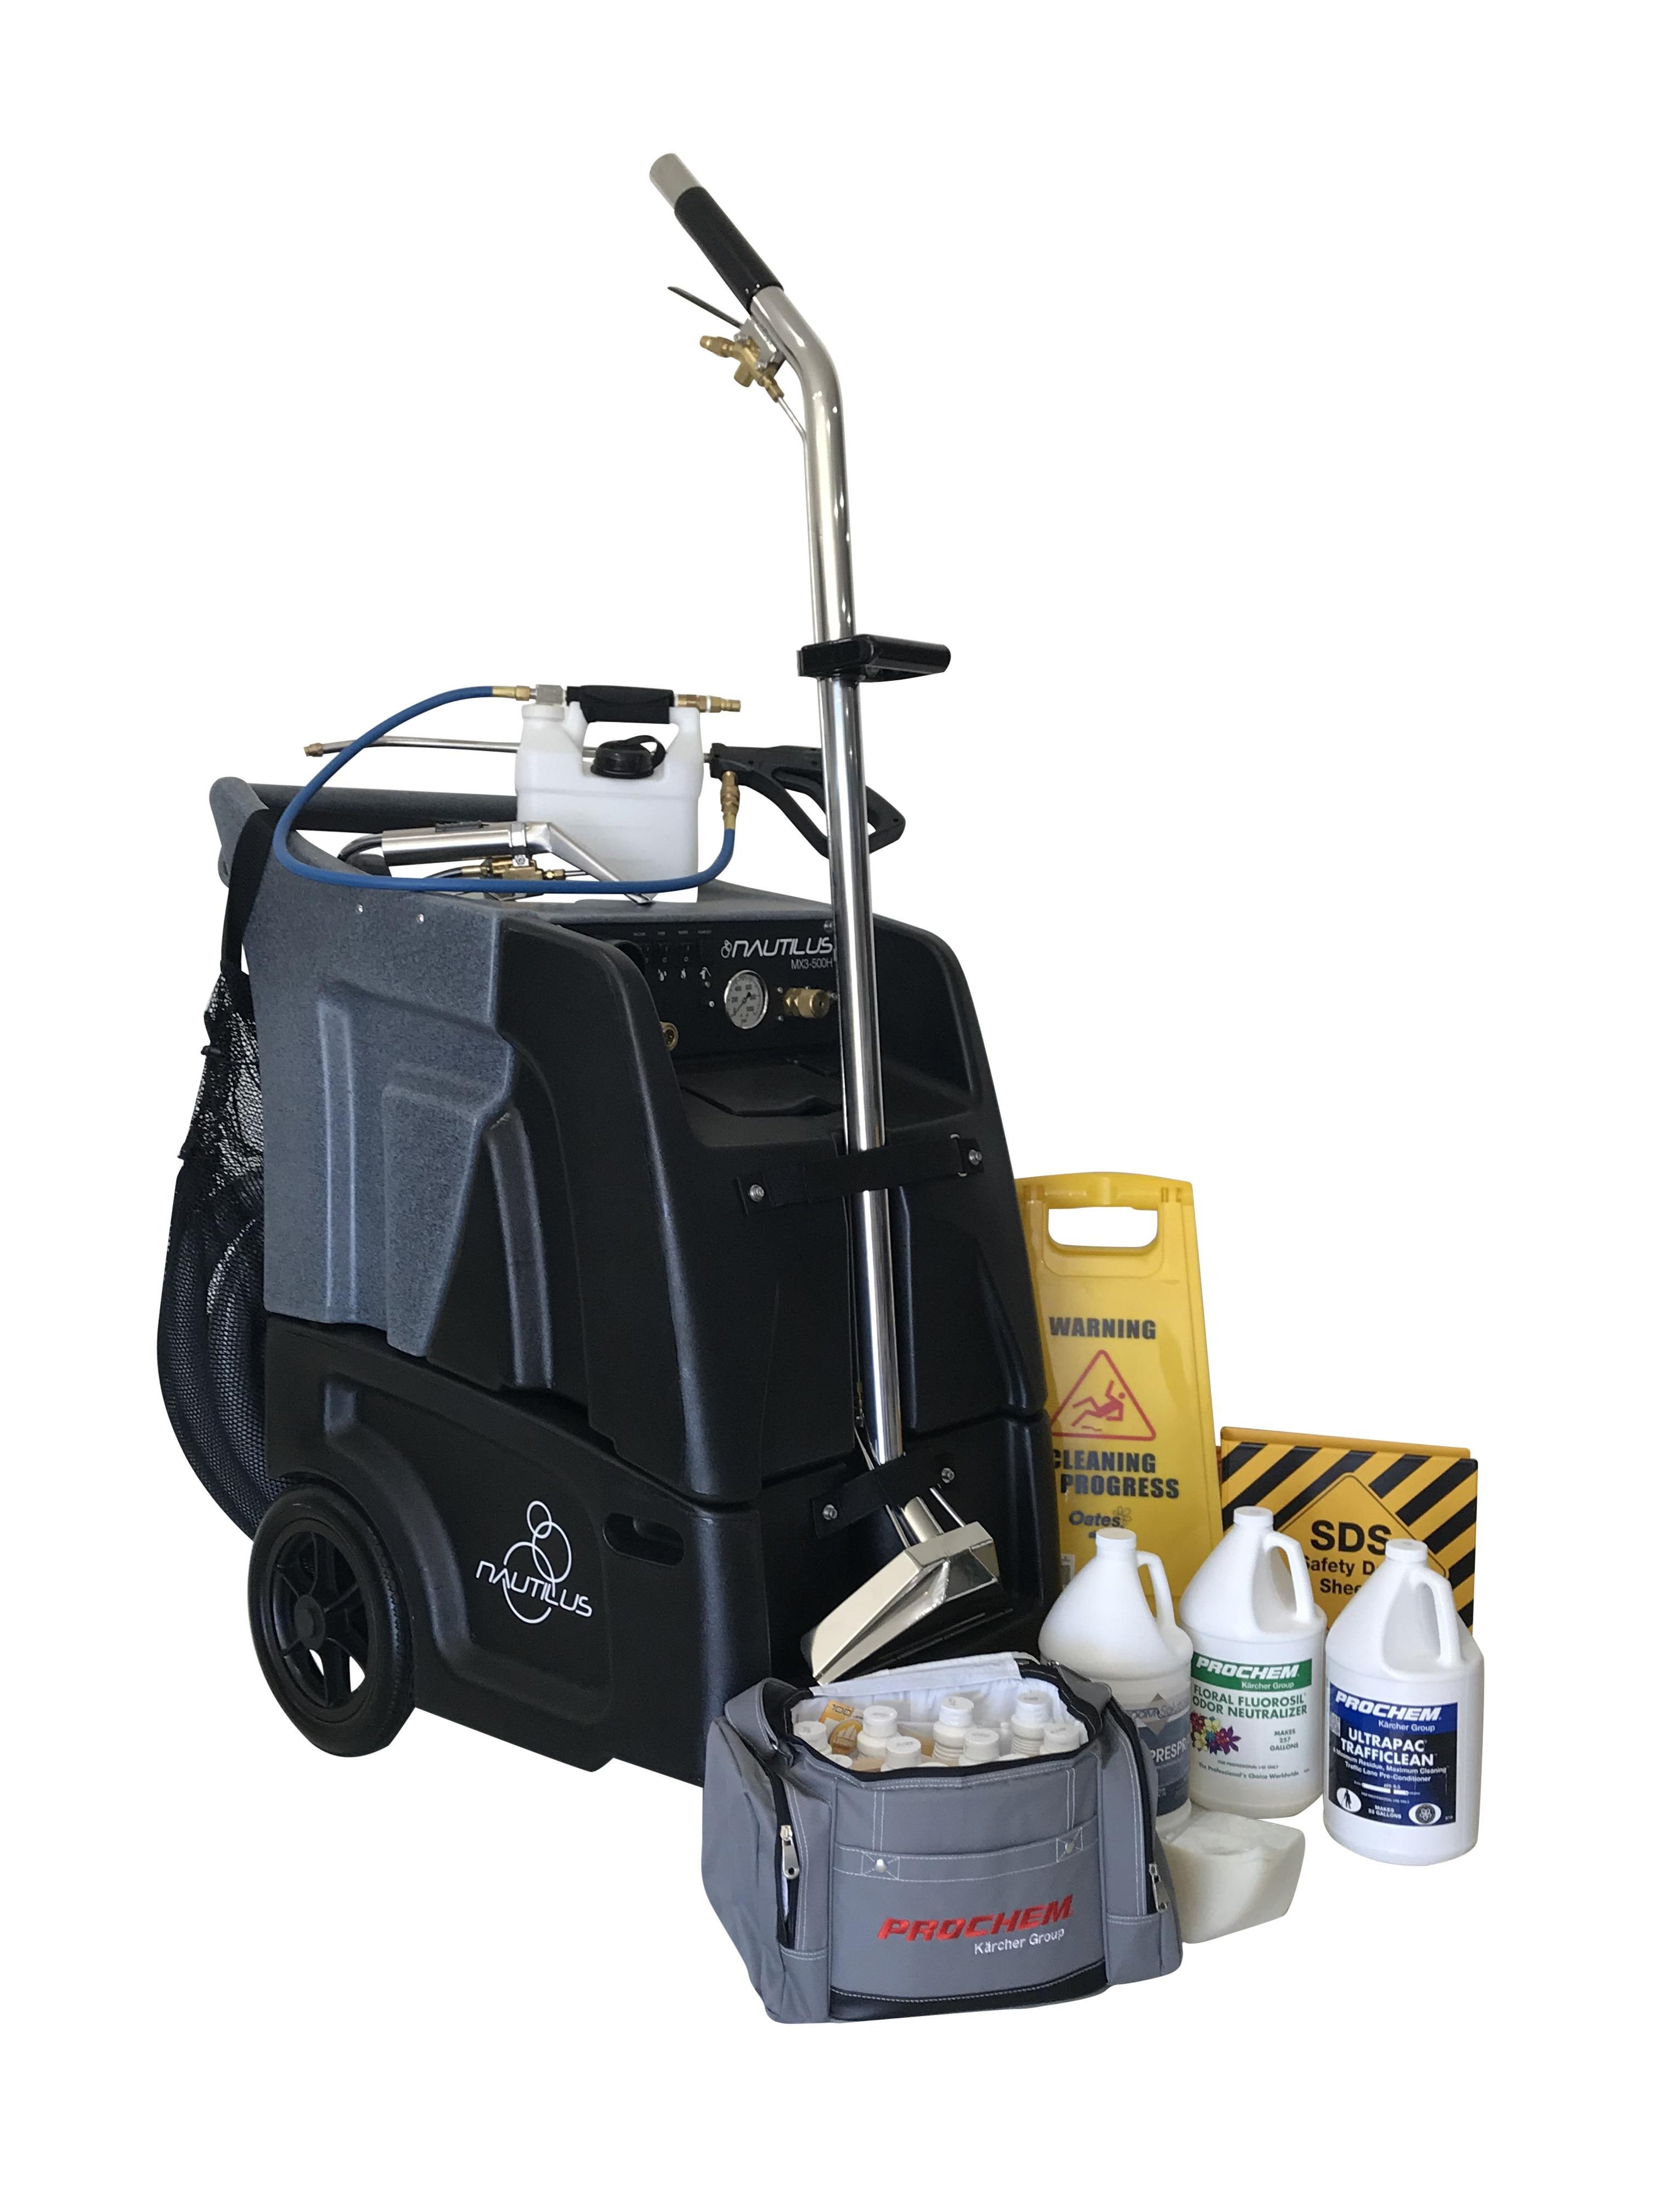 500Psi Hot Water Carpet Cleaning Kit